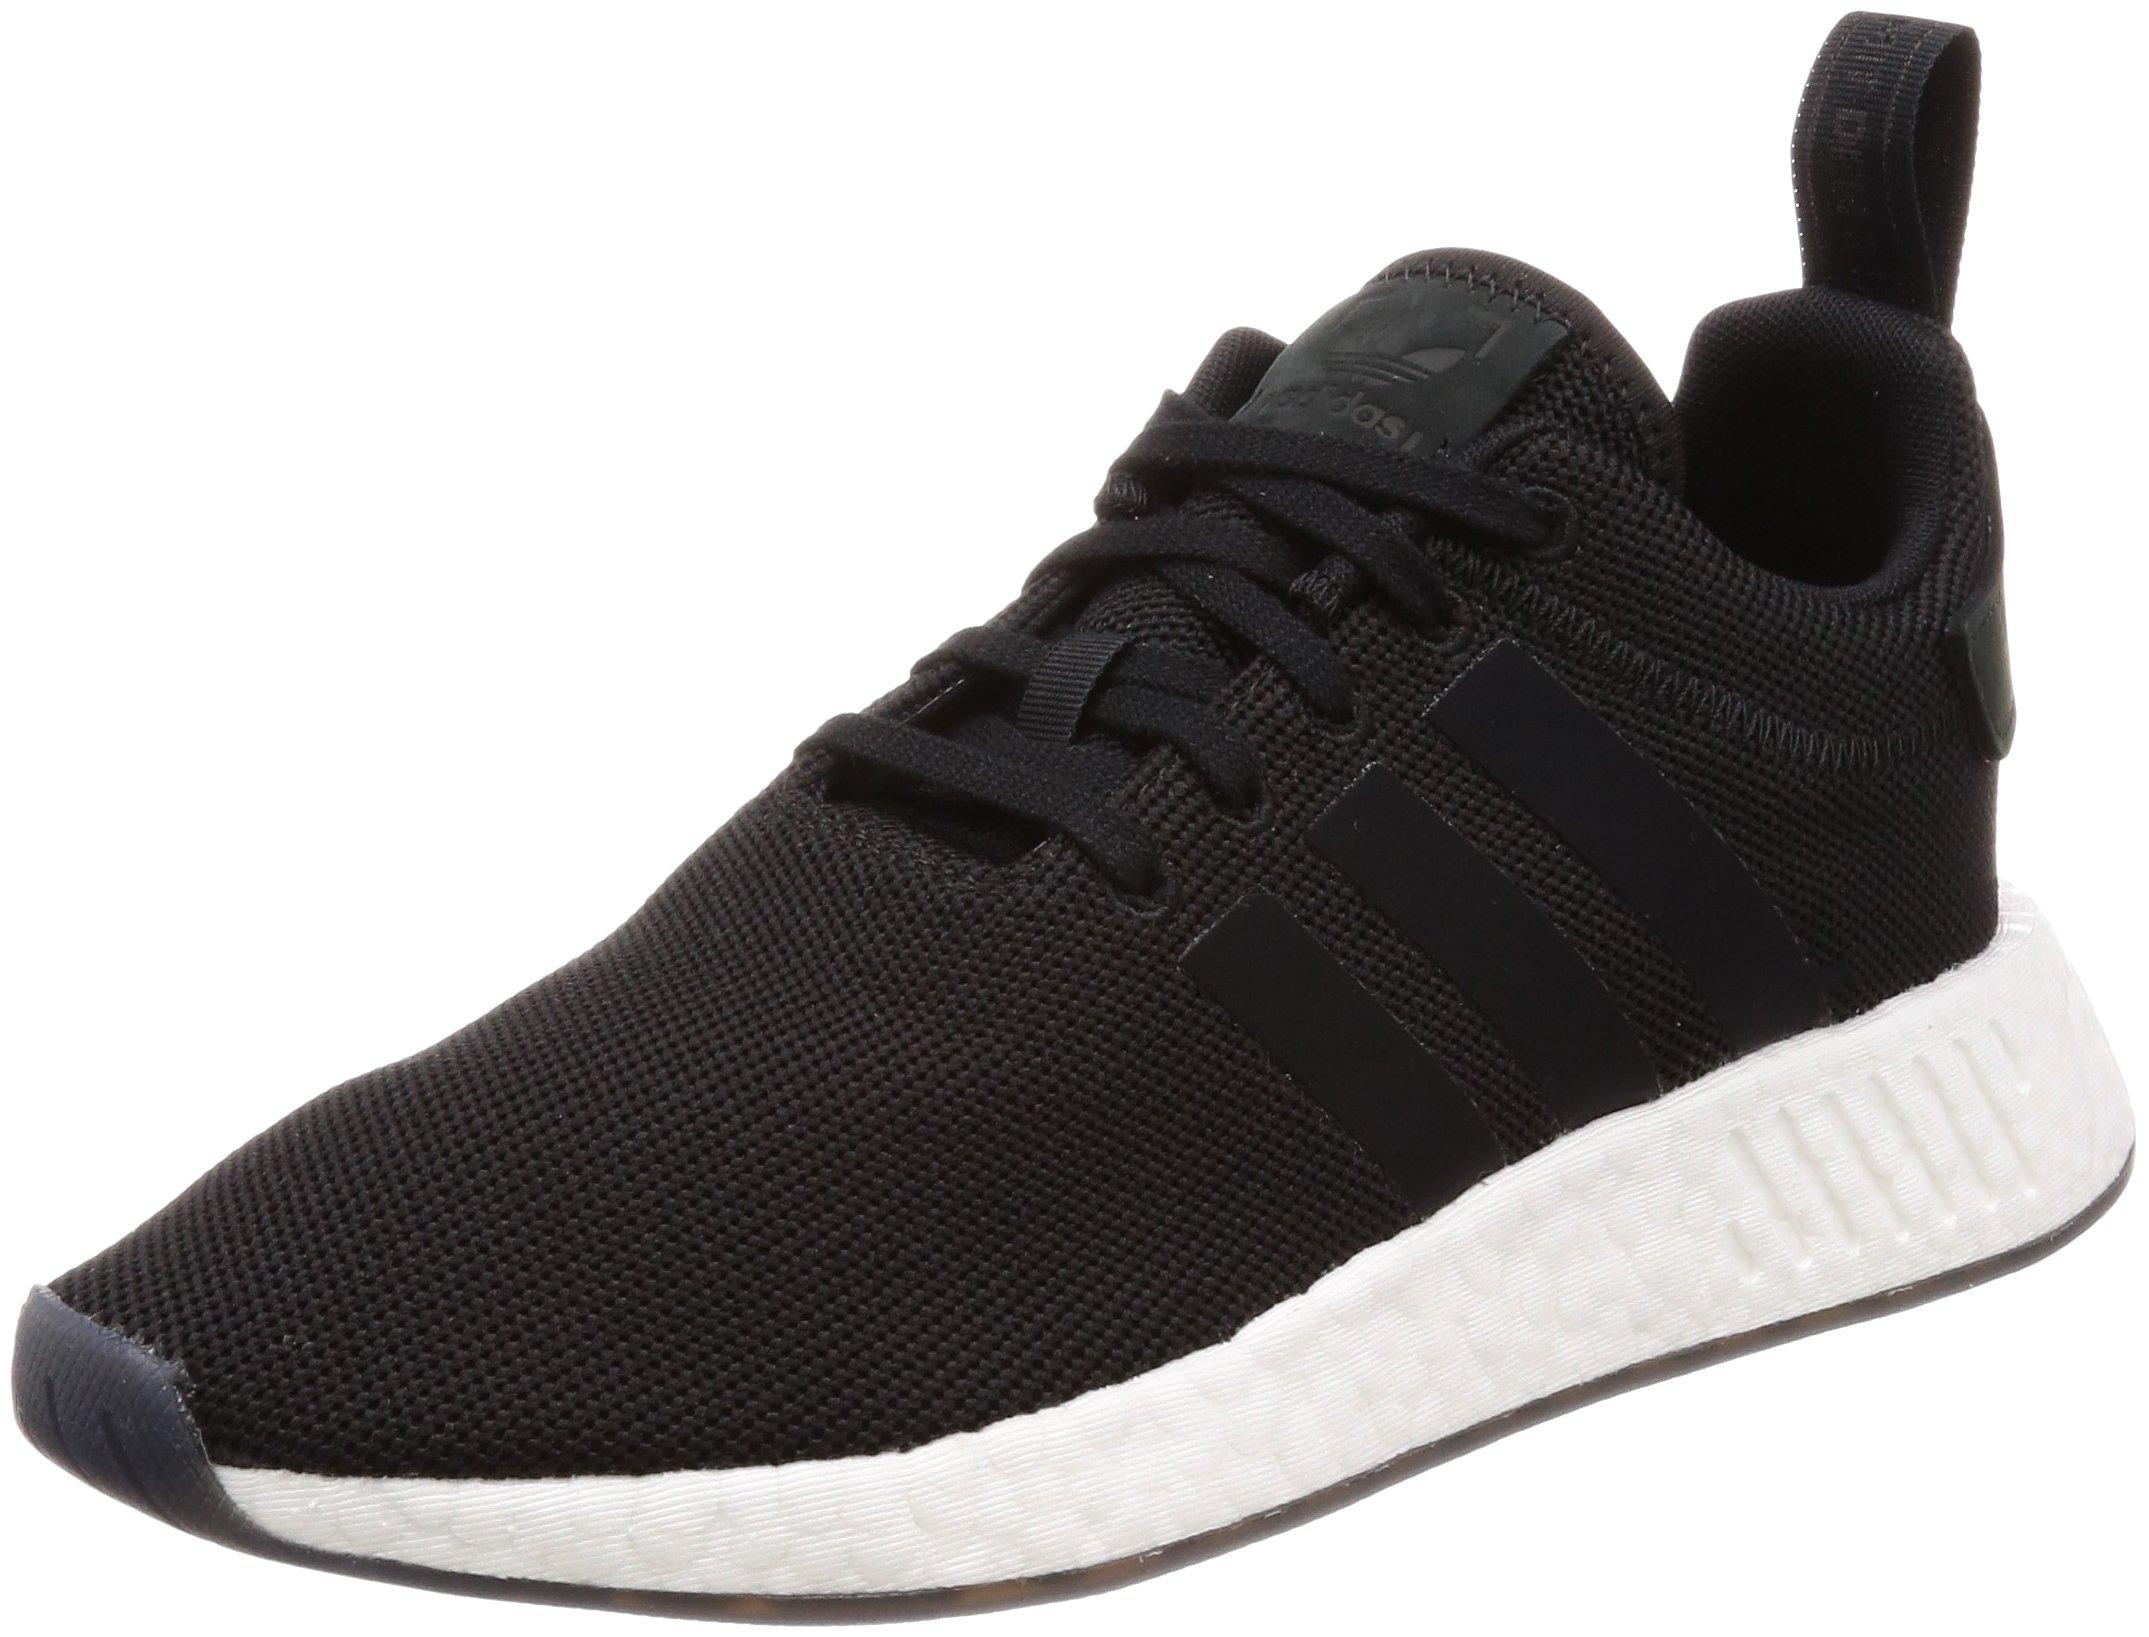 adidas Originals Unisex NMD R2 Sneakers Black in Size US 6.5 Men = 7.5 Women